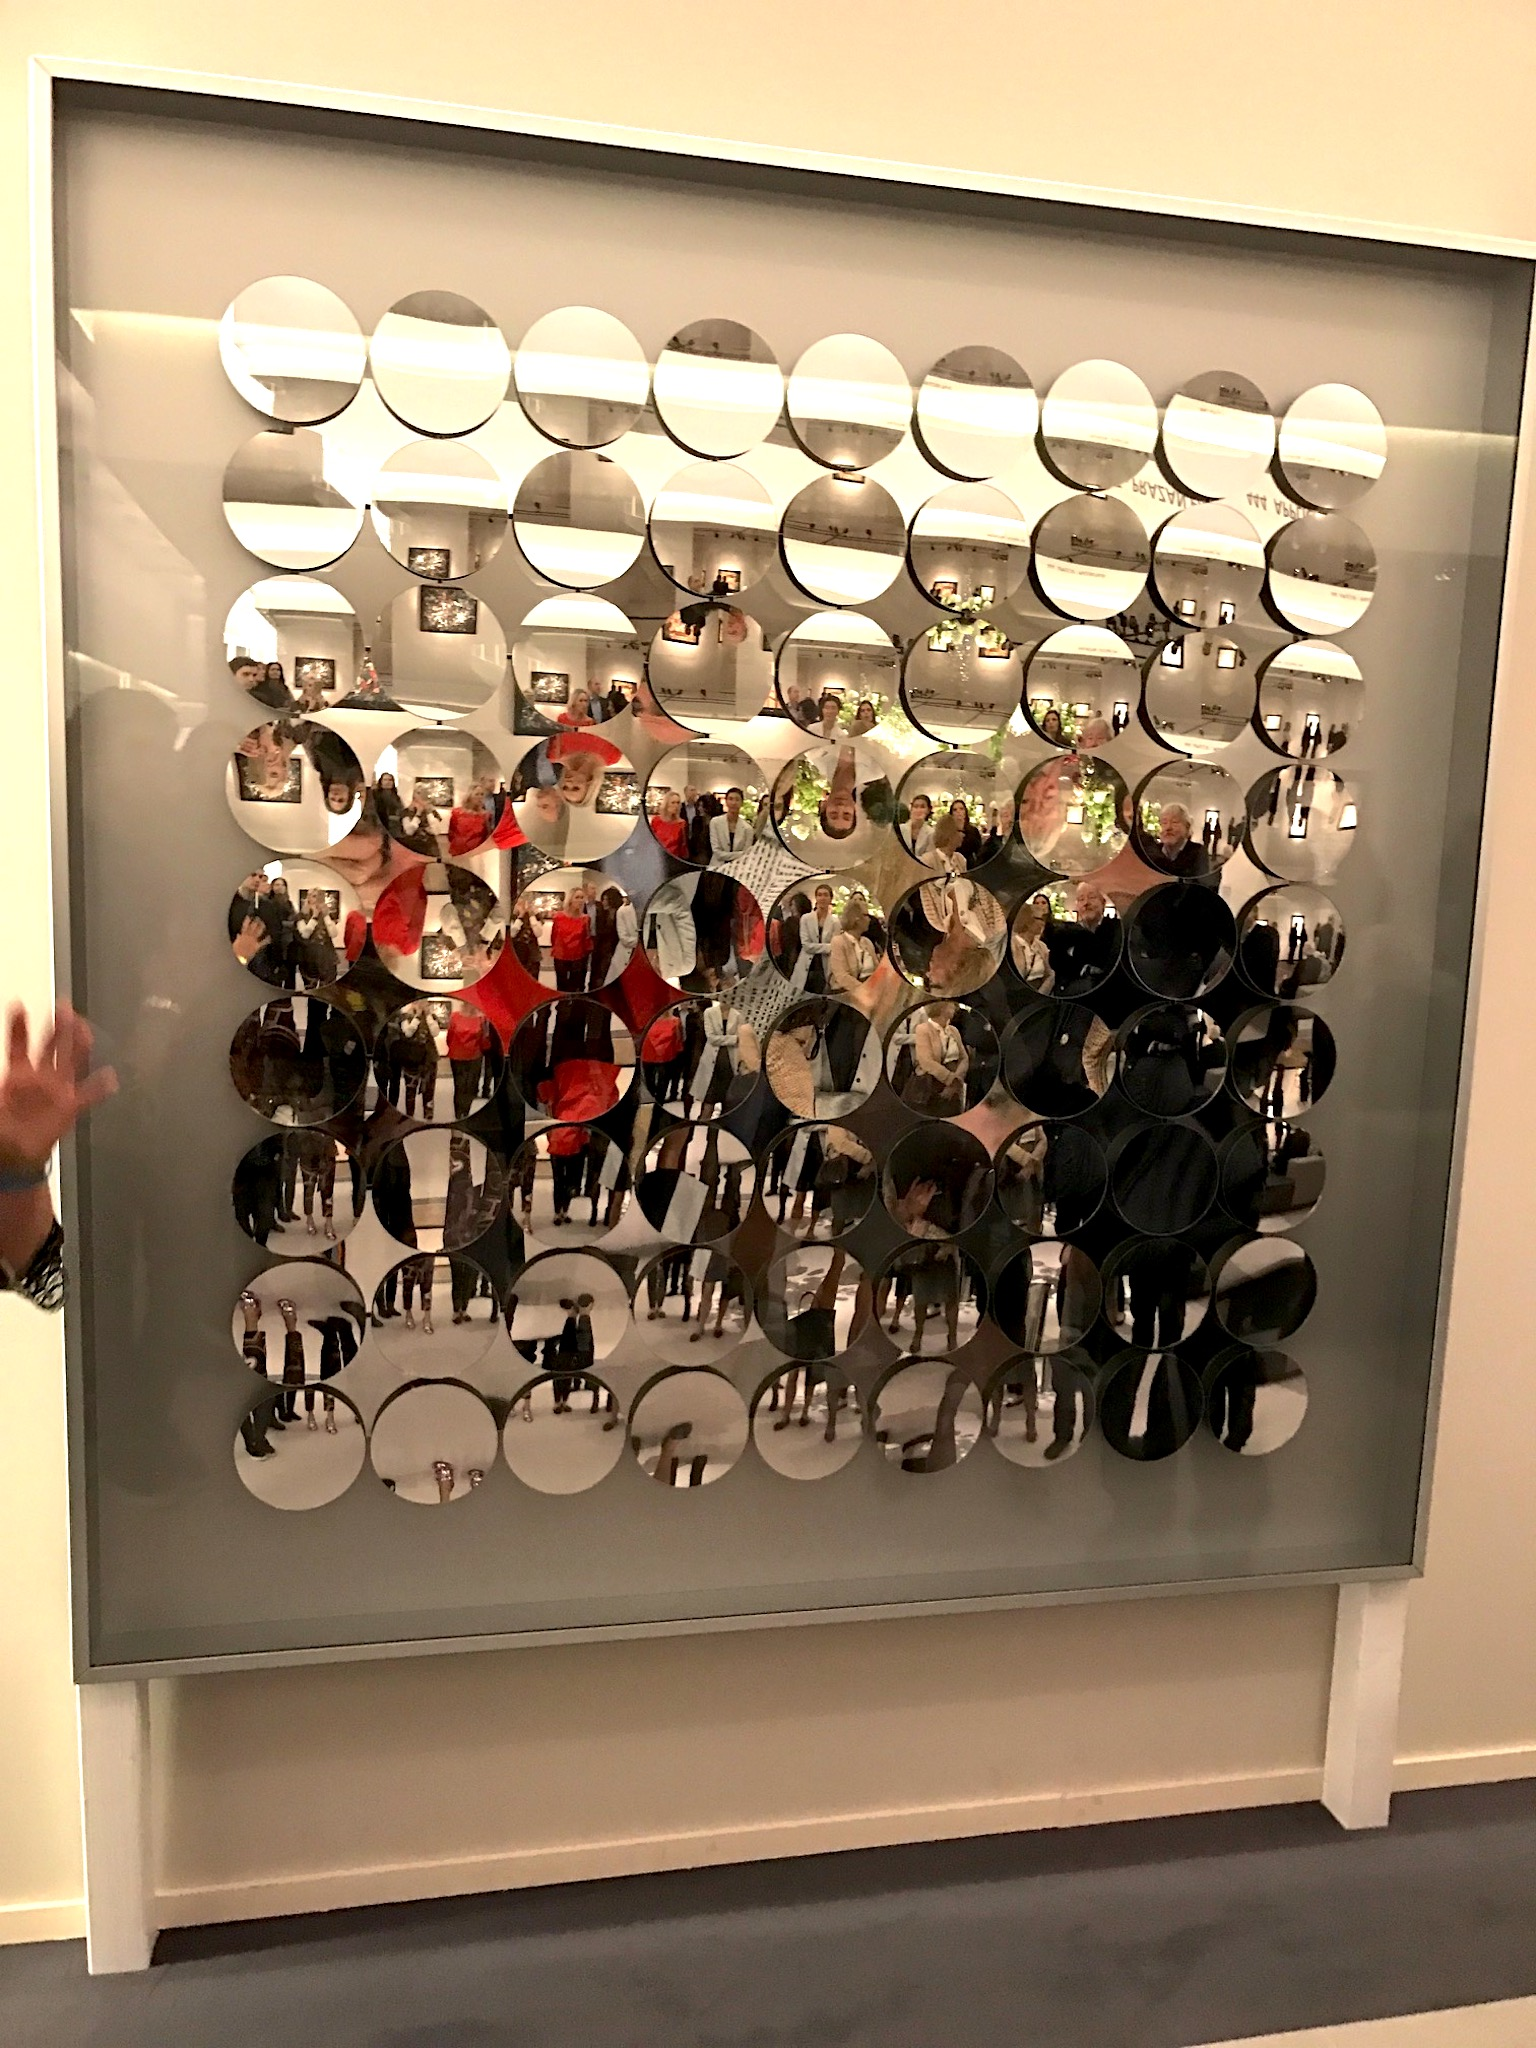 TEFAF art tour, Adolf Luther, Galerie Thomas München, Special Mirror Object, Lieblingsstil.com, IMG_6111